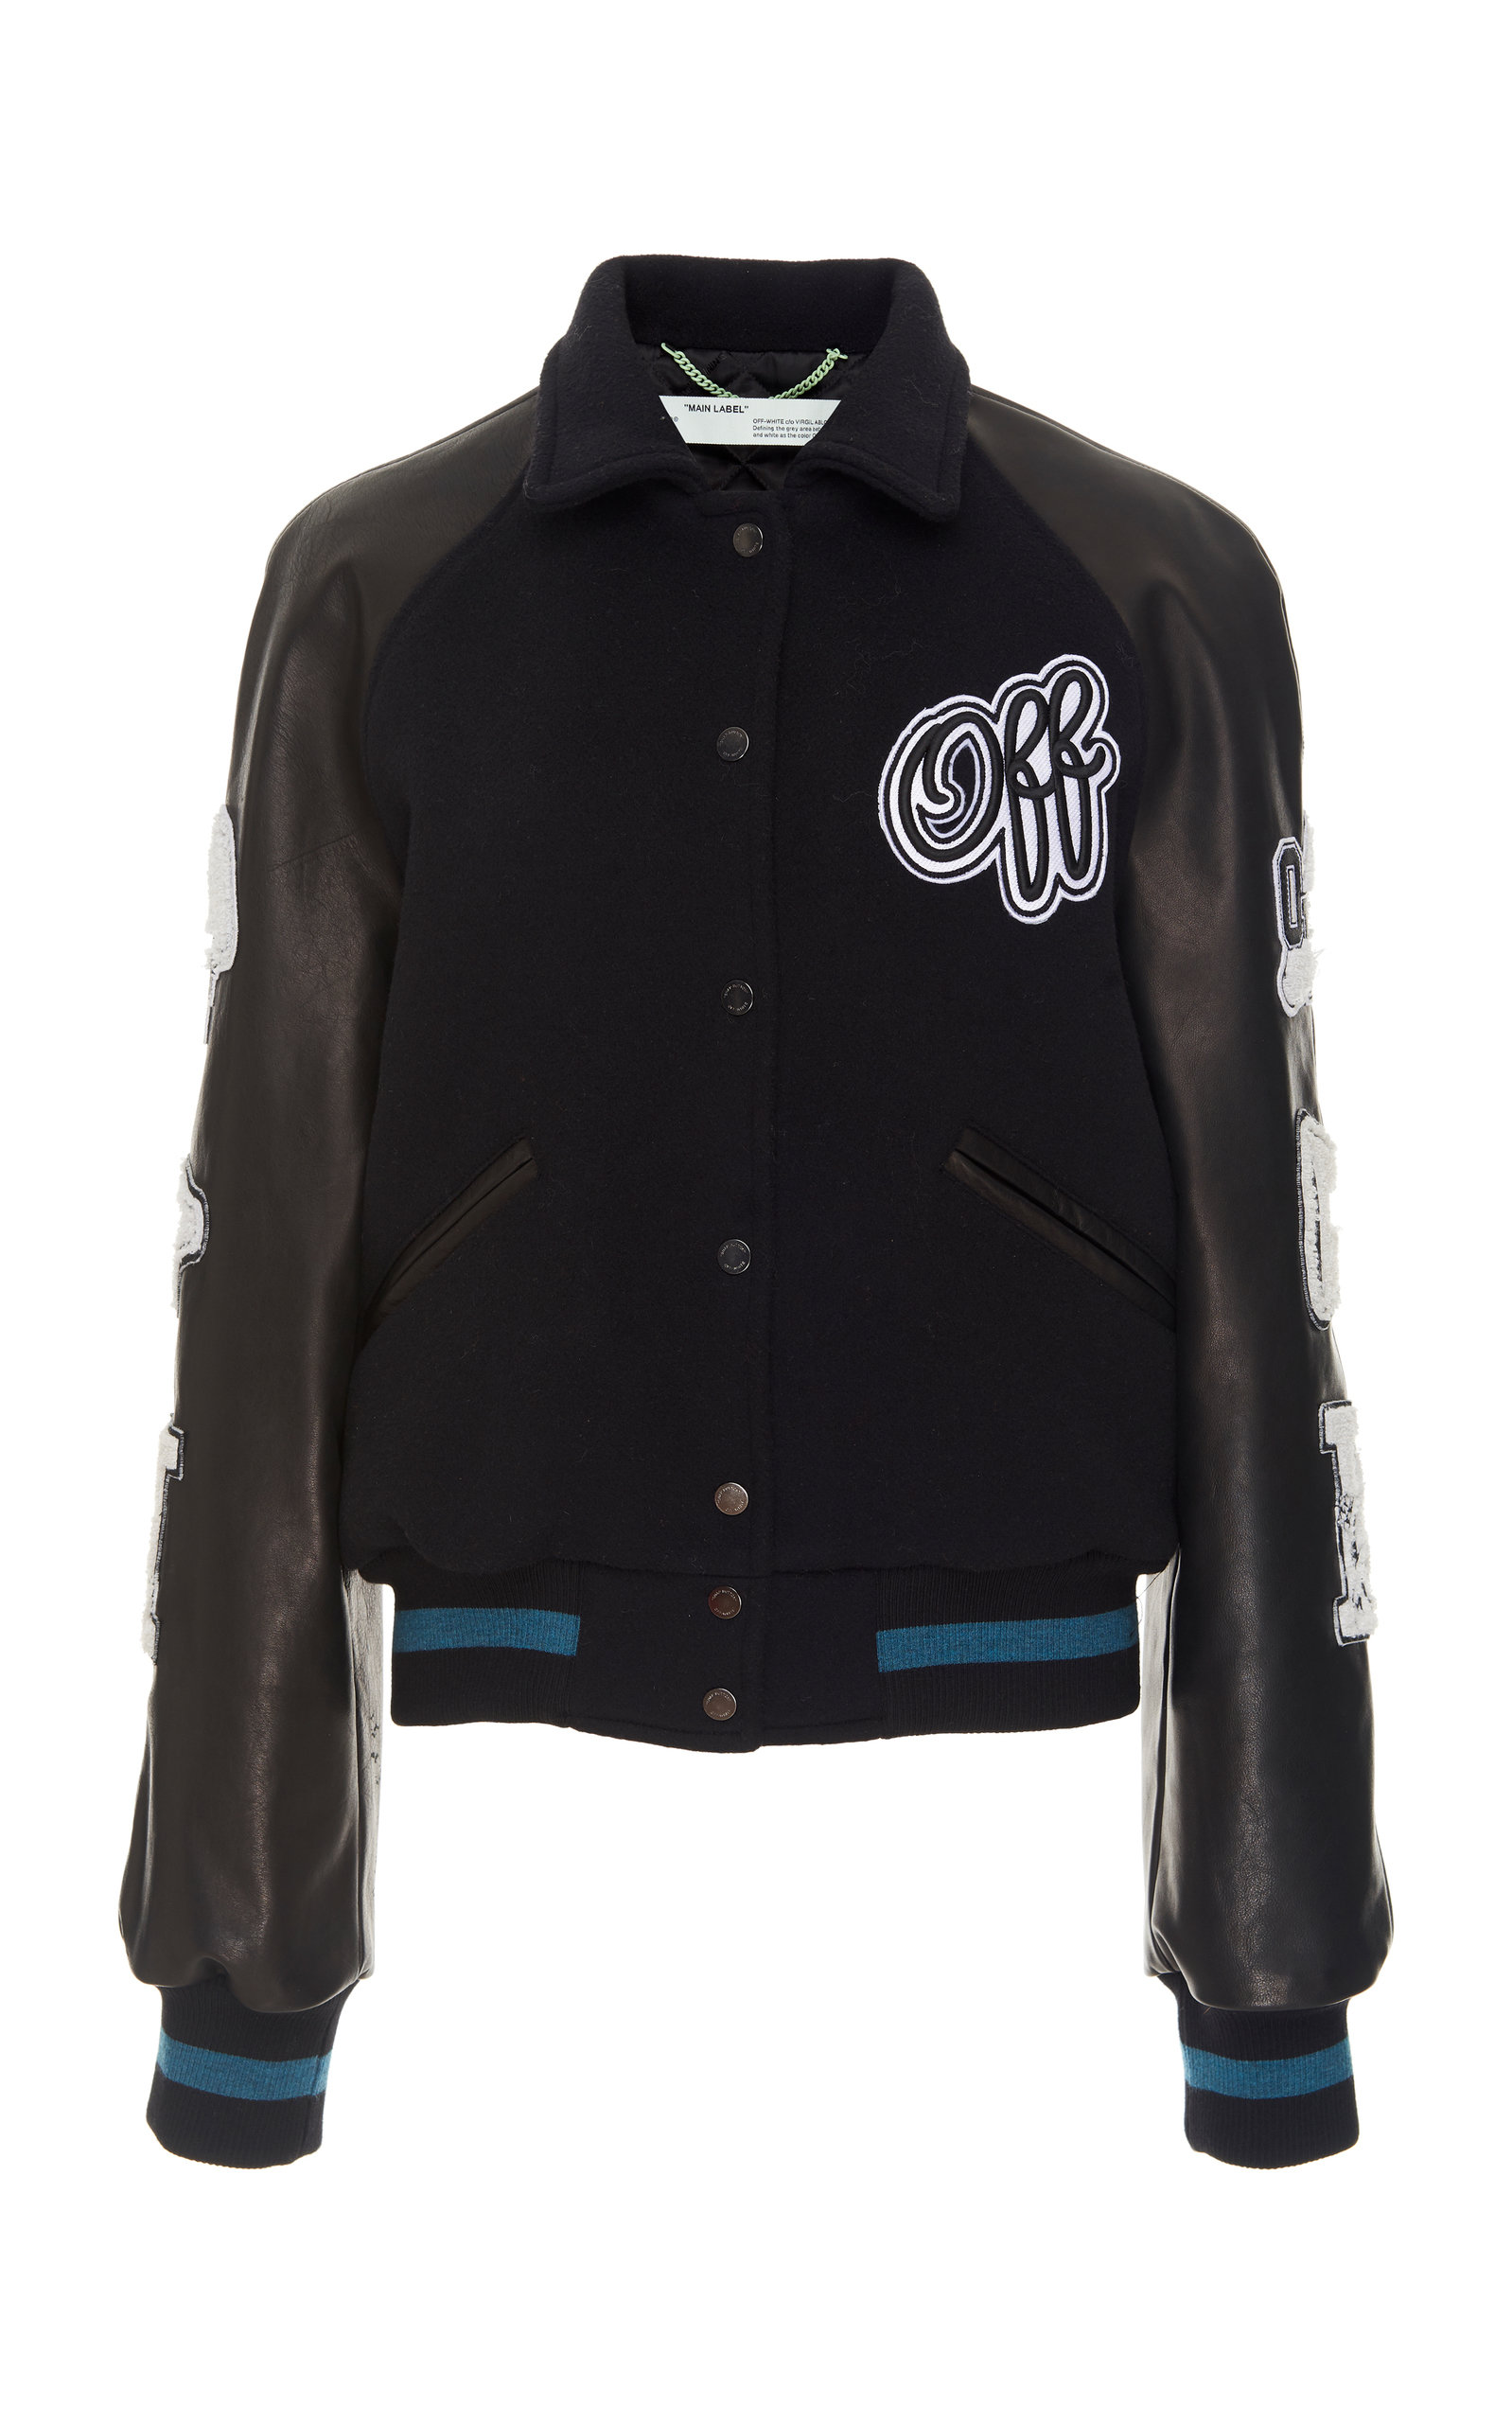 df09ab1d9e12 Vintage Wool-Blend Varsity Jacket by Off-White c o Virgil Abloh ...